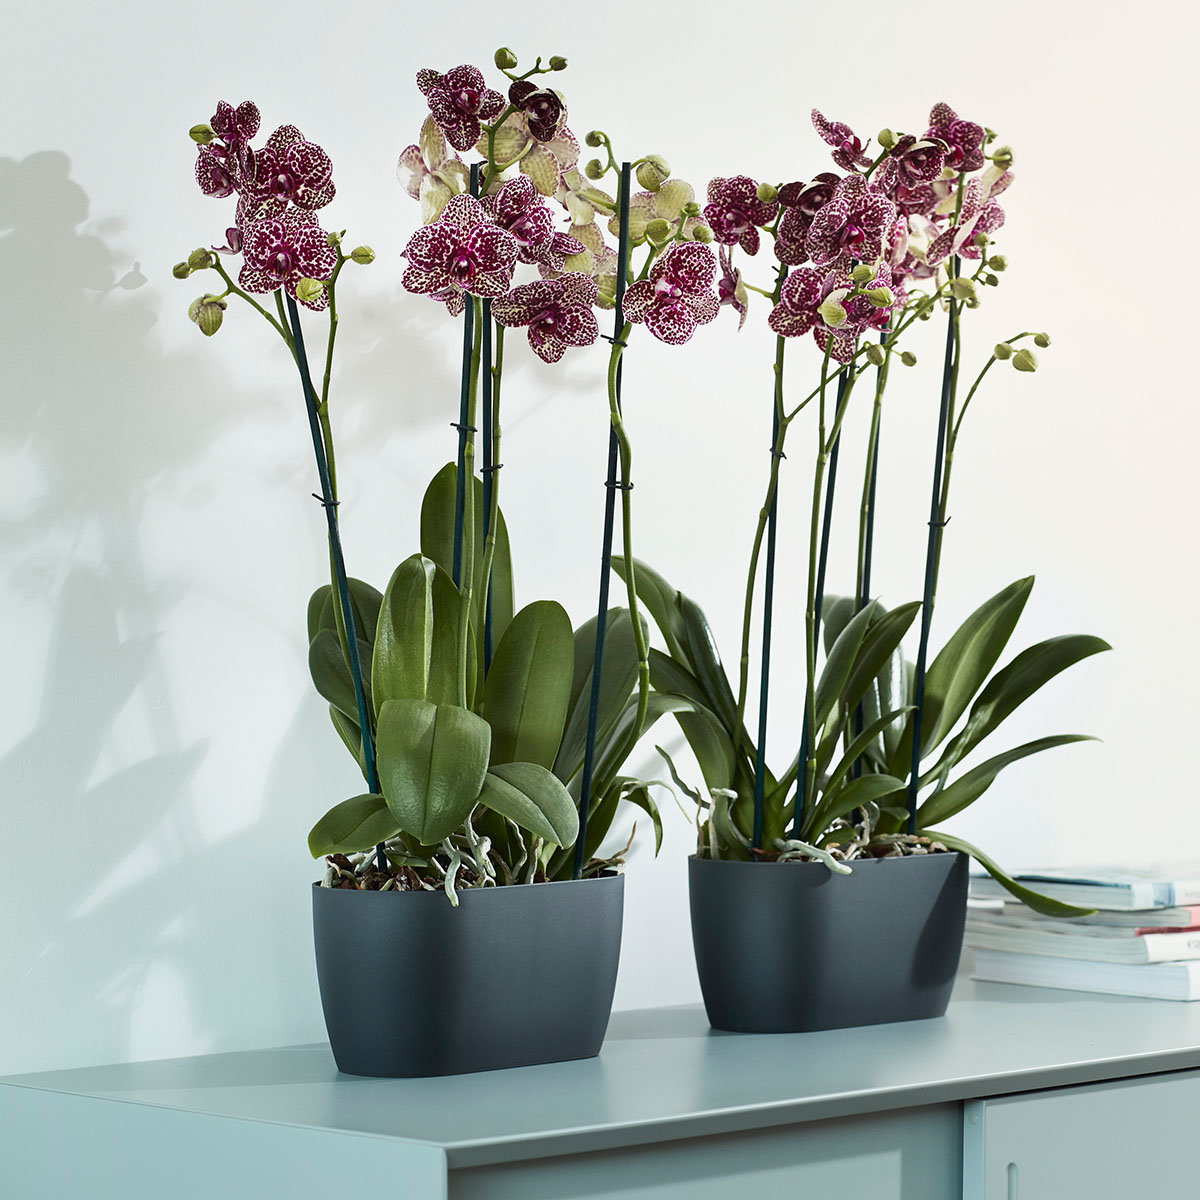 Orchideengefäß Brüssel Duo, 12,6x13x25 cm, kirsche | #3